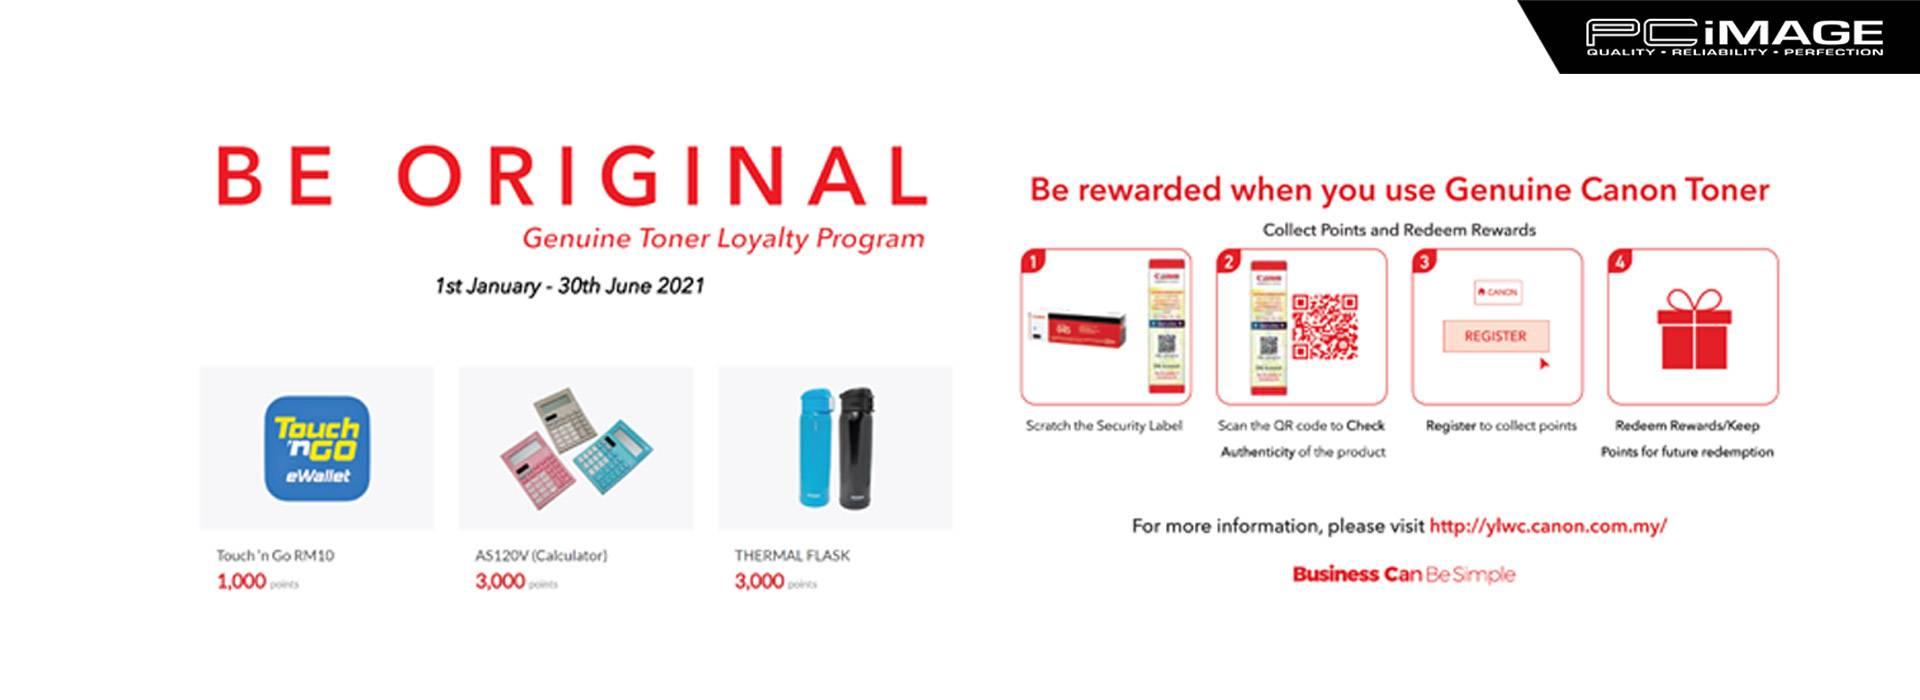 Genuine Toner Loyalty Program 30 June